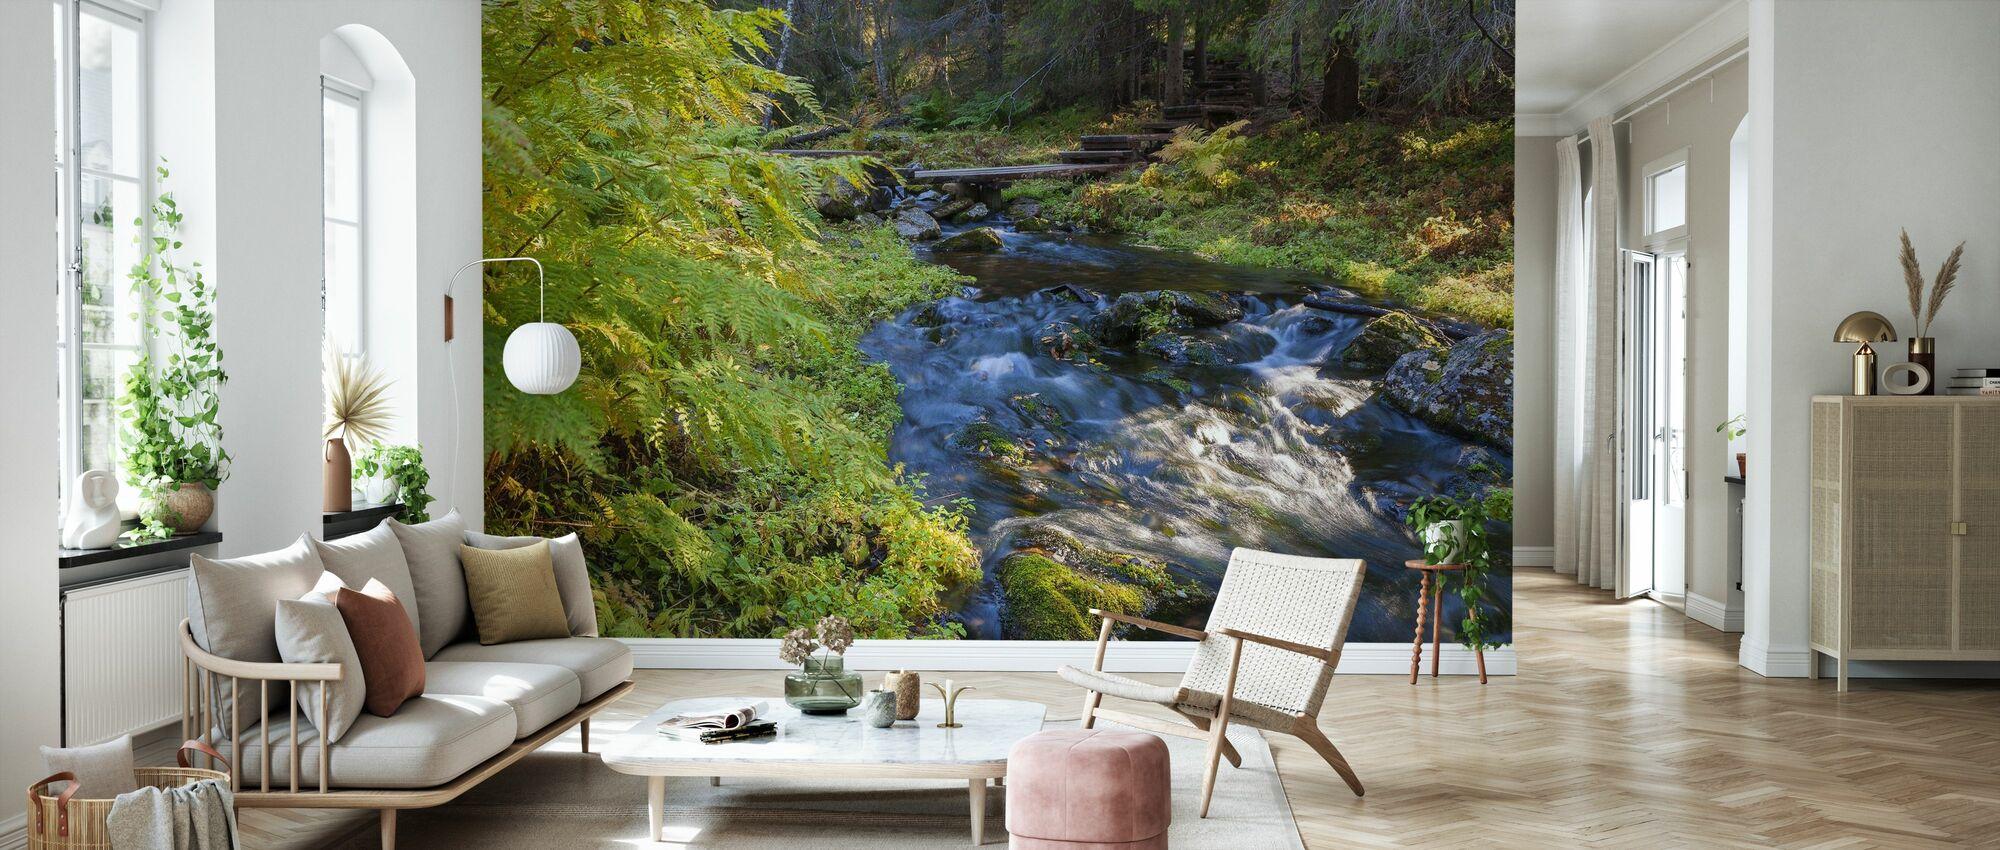 National park Finland - Wallpaper - Living Room